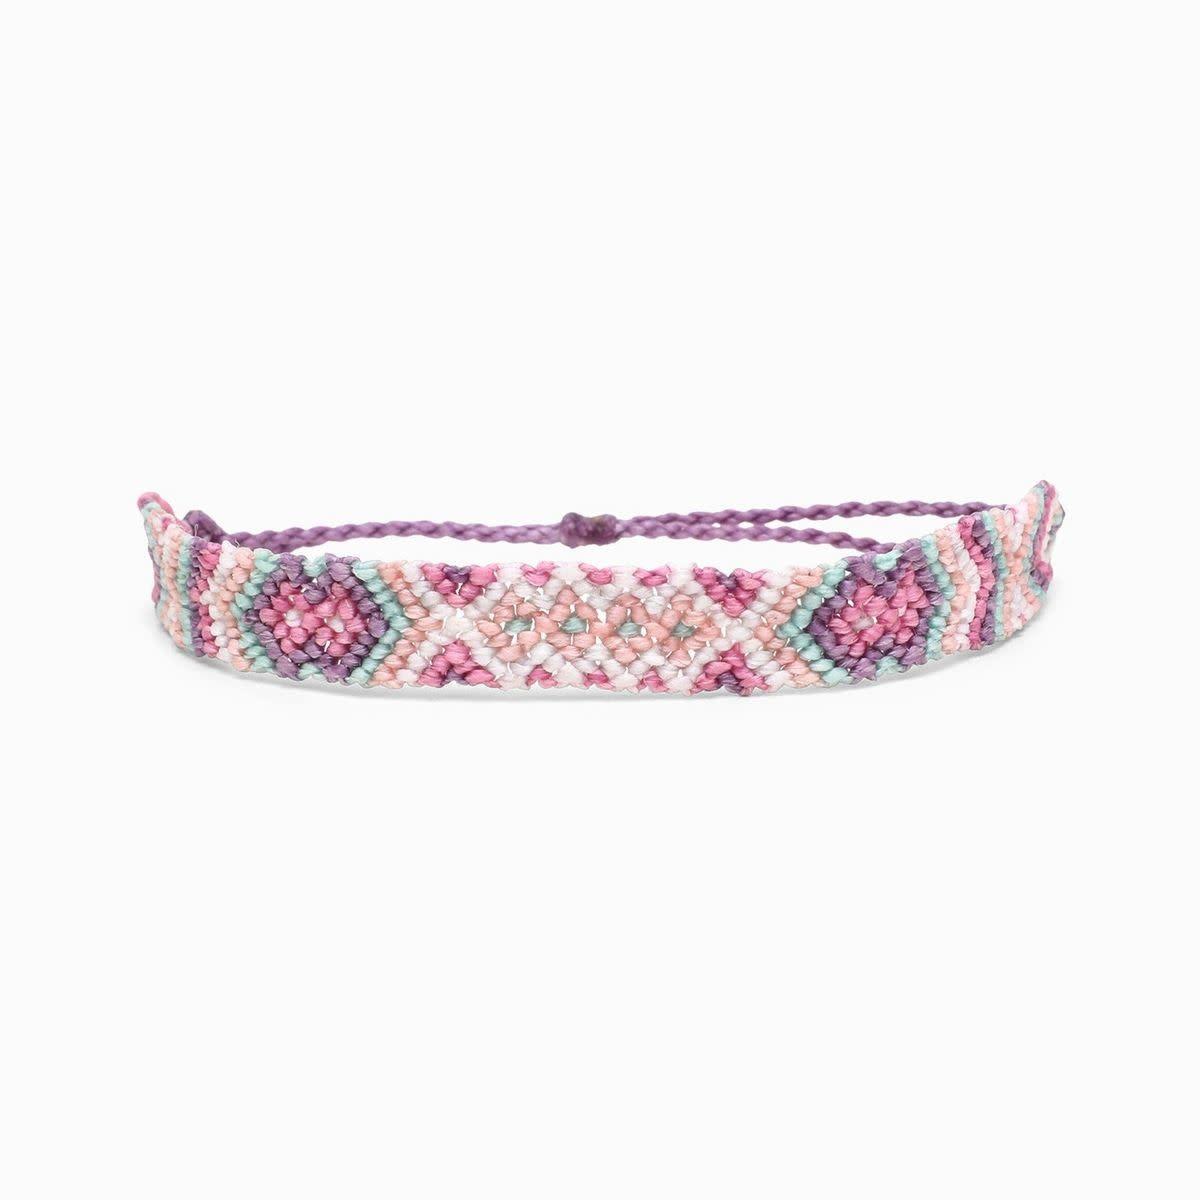 Macrame Friendship Bracelet